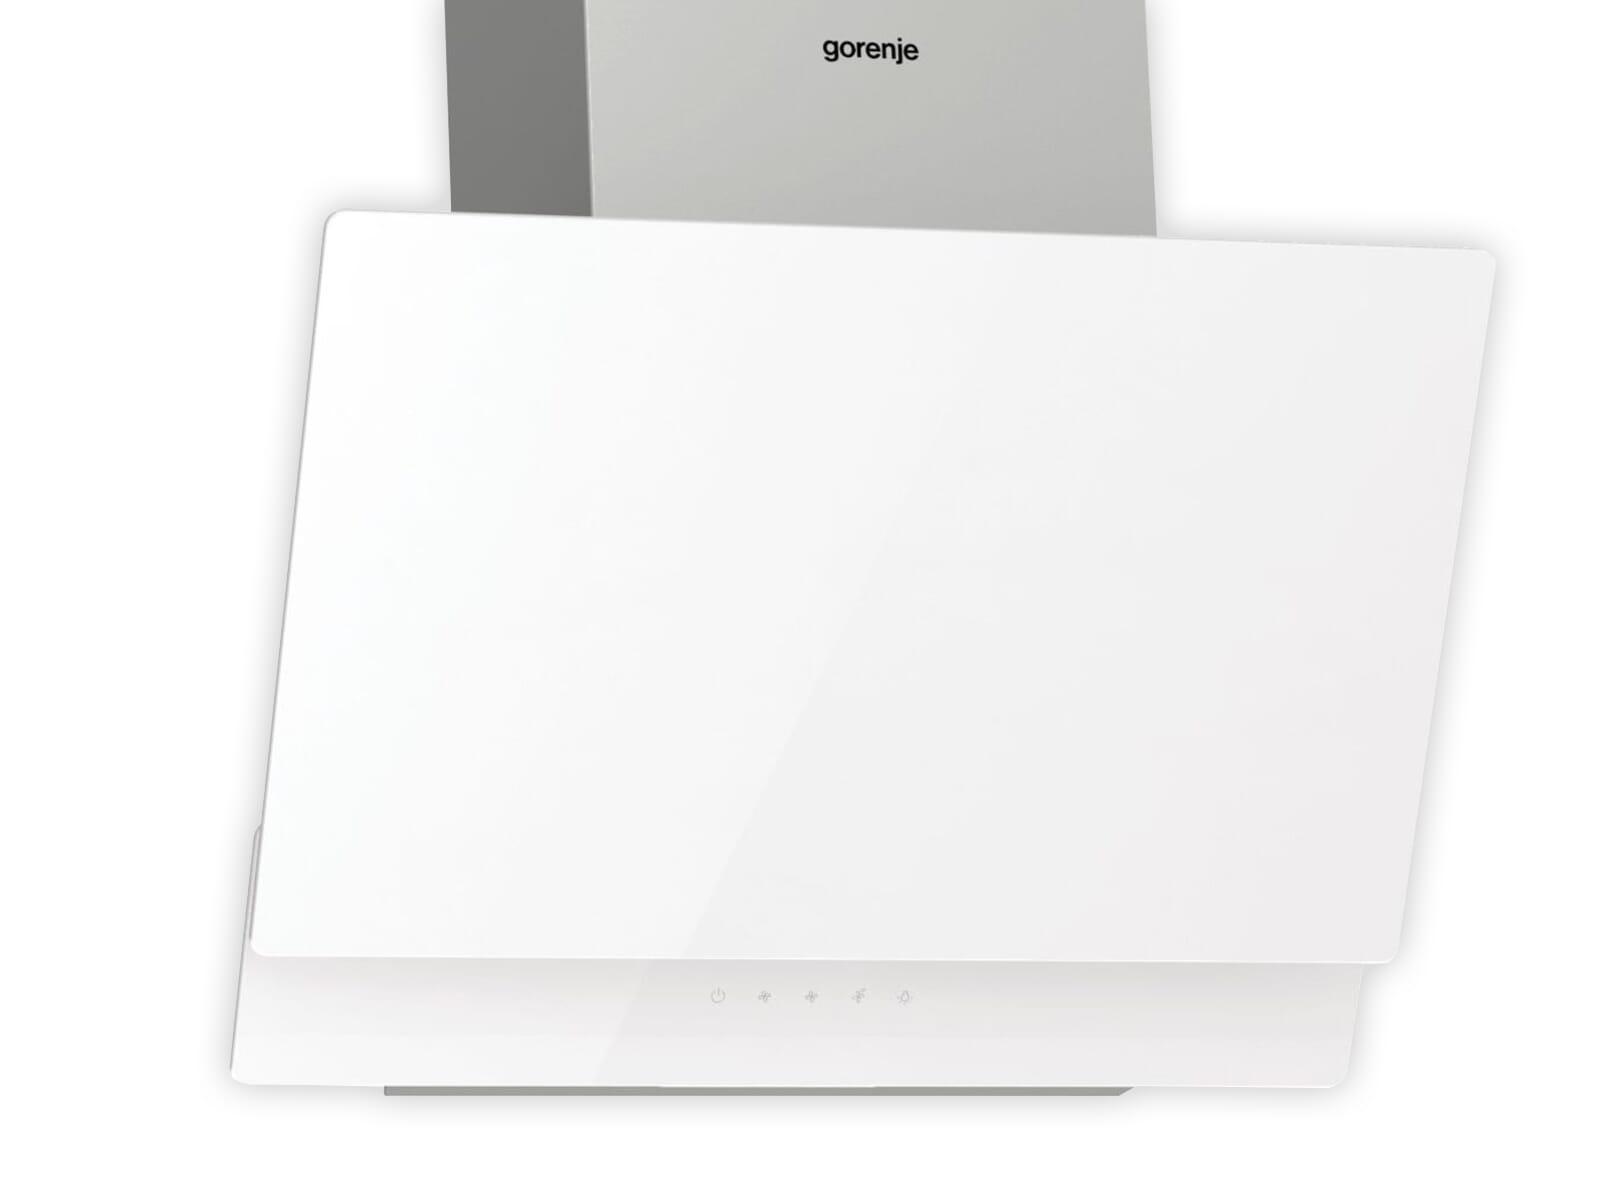 Gorenje WHI649EXGW Kopffreihaube 60 cm Weiß